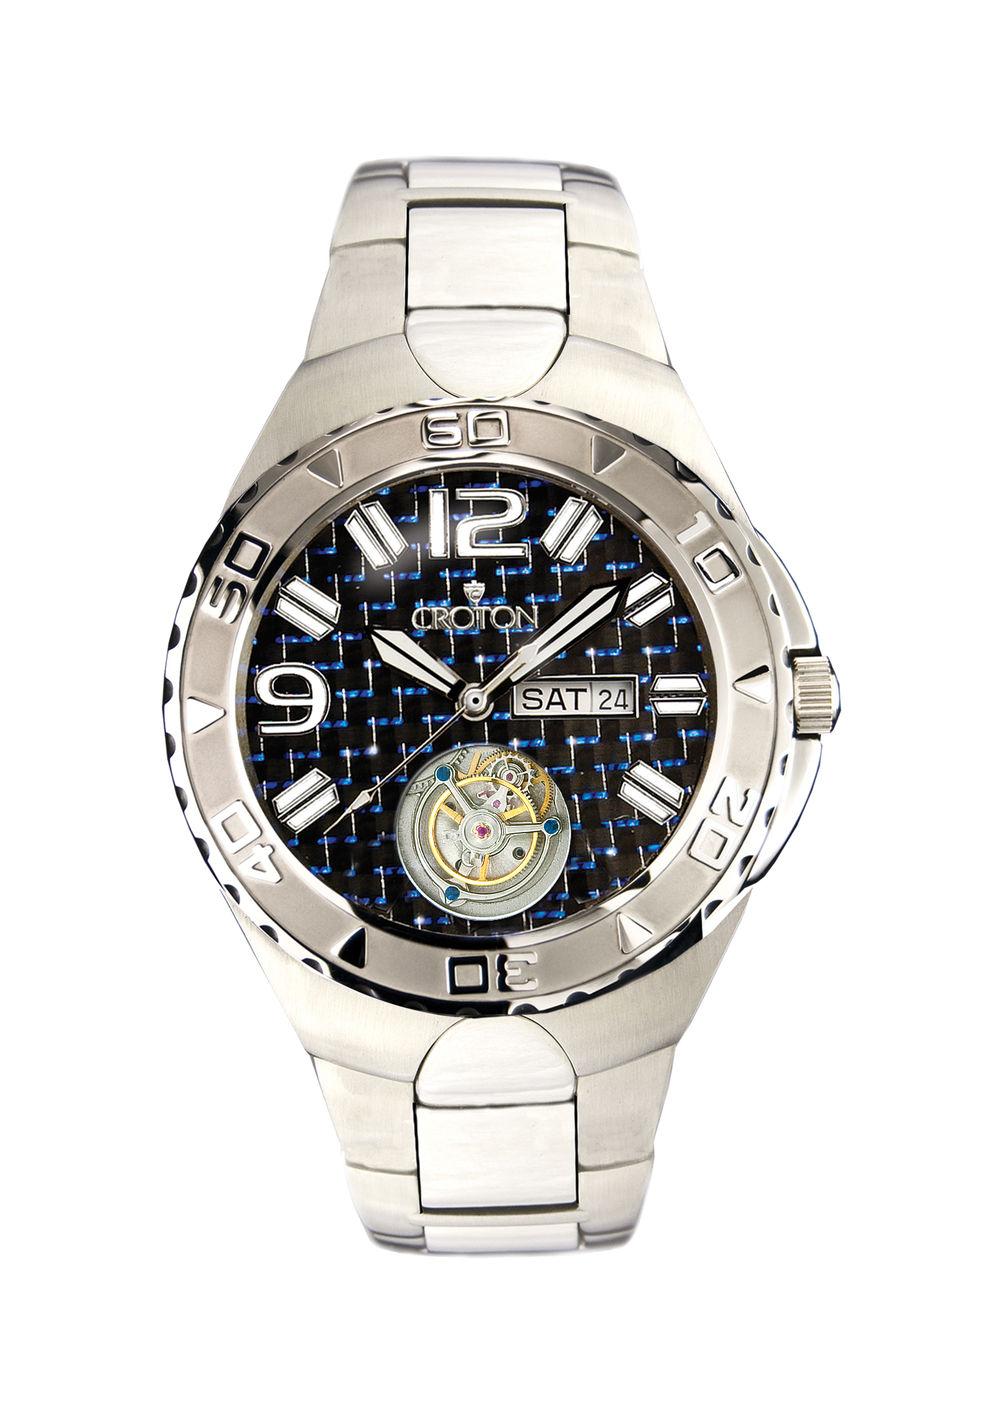 men s croton watch c cn307423ssbl 2 437 50 fine jewelry for men s croton watch